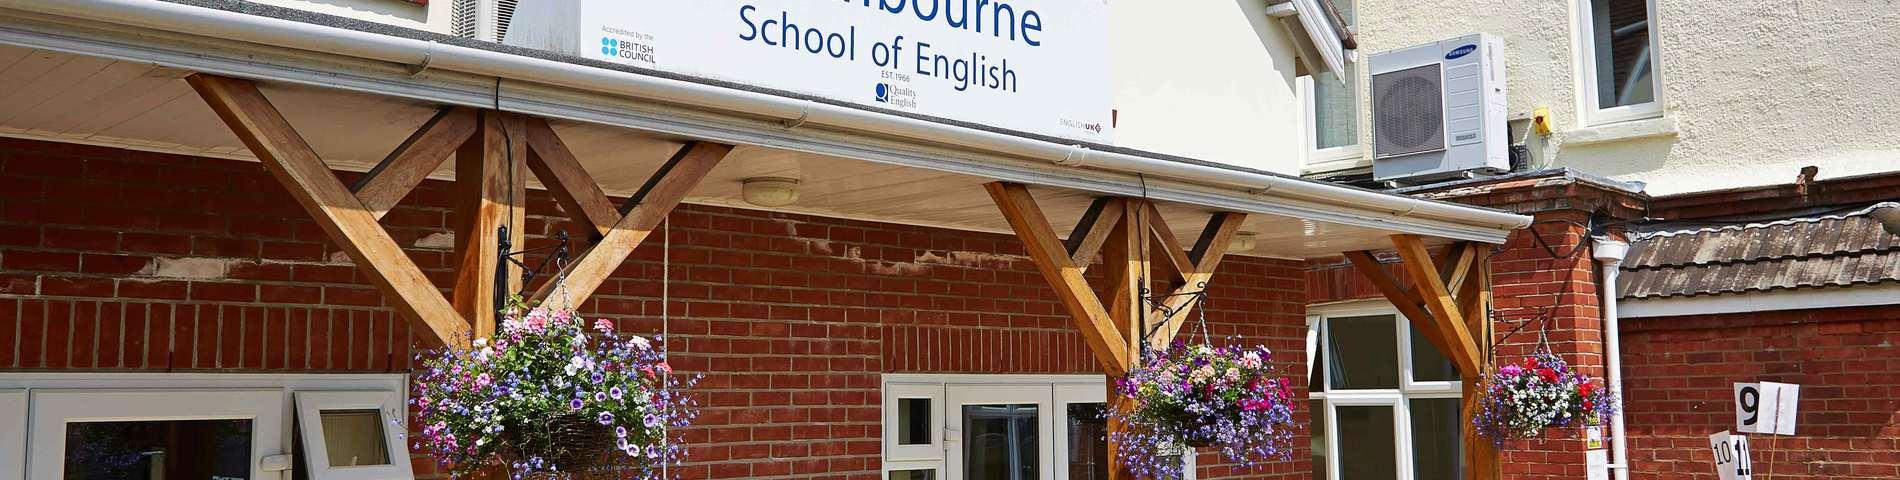 Southbourne School of English画像1